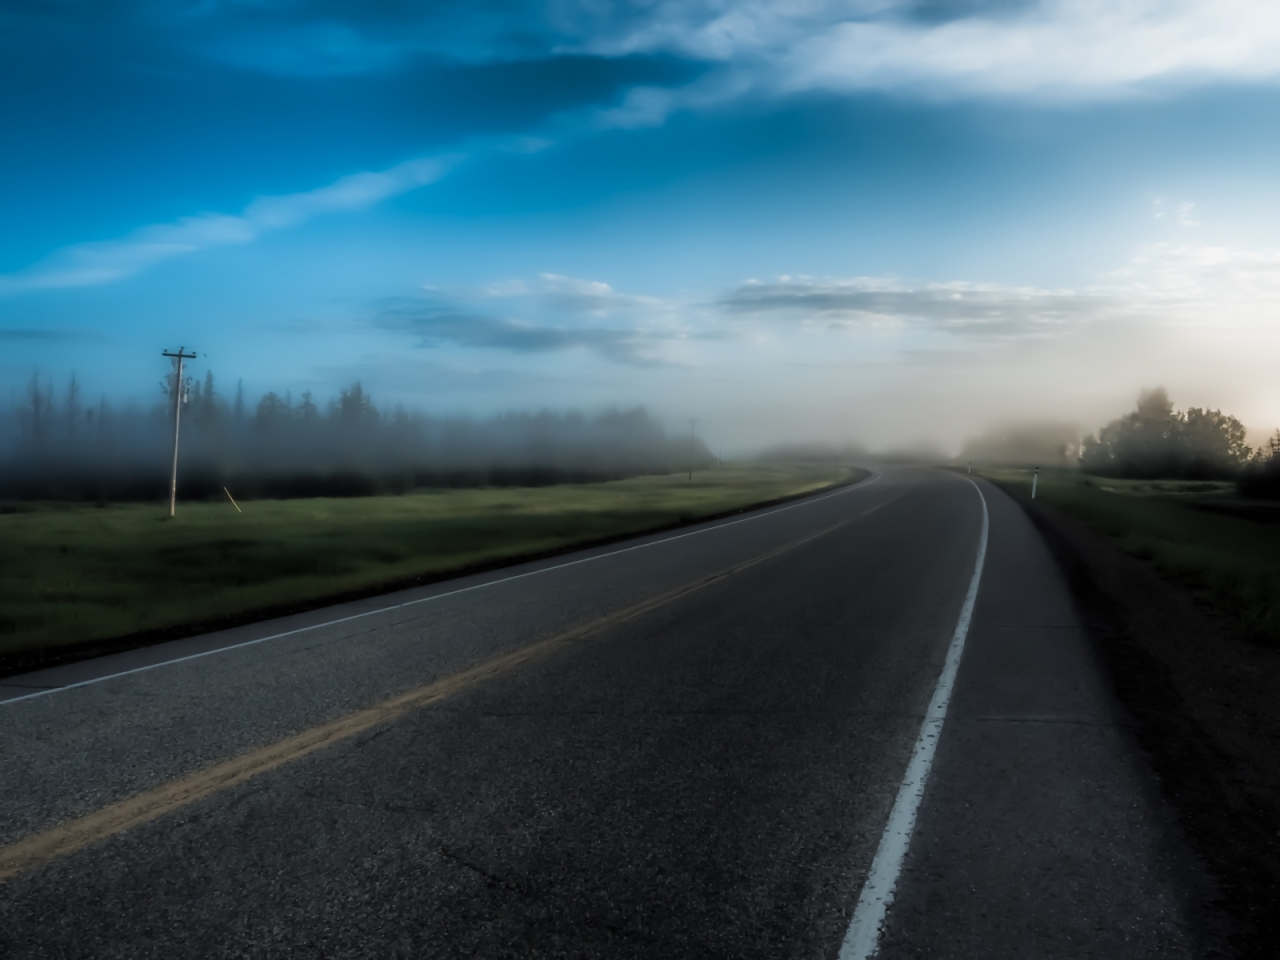 Morning Images - High Level, Alberta - Canada 4